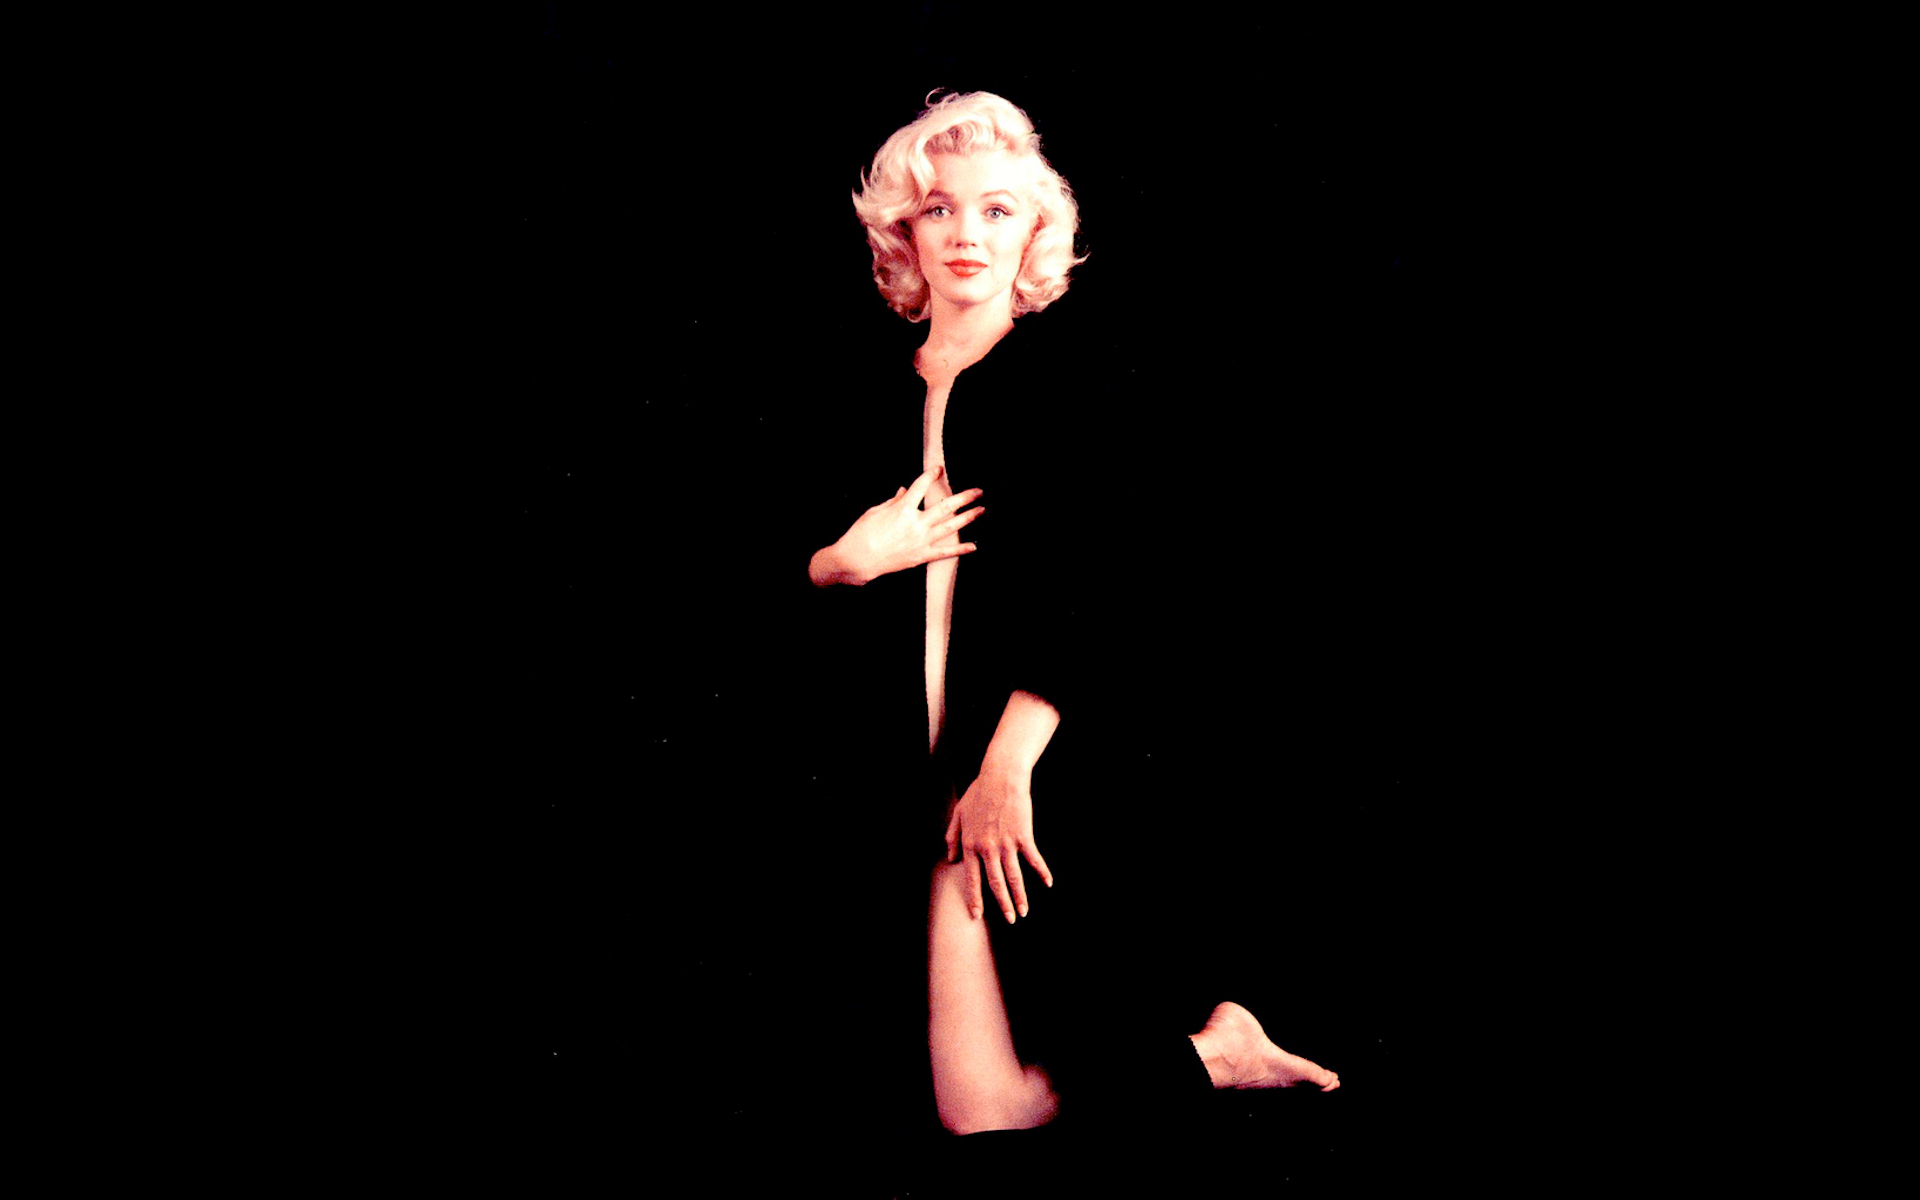 Marilyn monroe hd wallpaper background image 1920x1200 id 812644 wallpaper abyss - Marilyn monroe wallpaper download ...